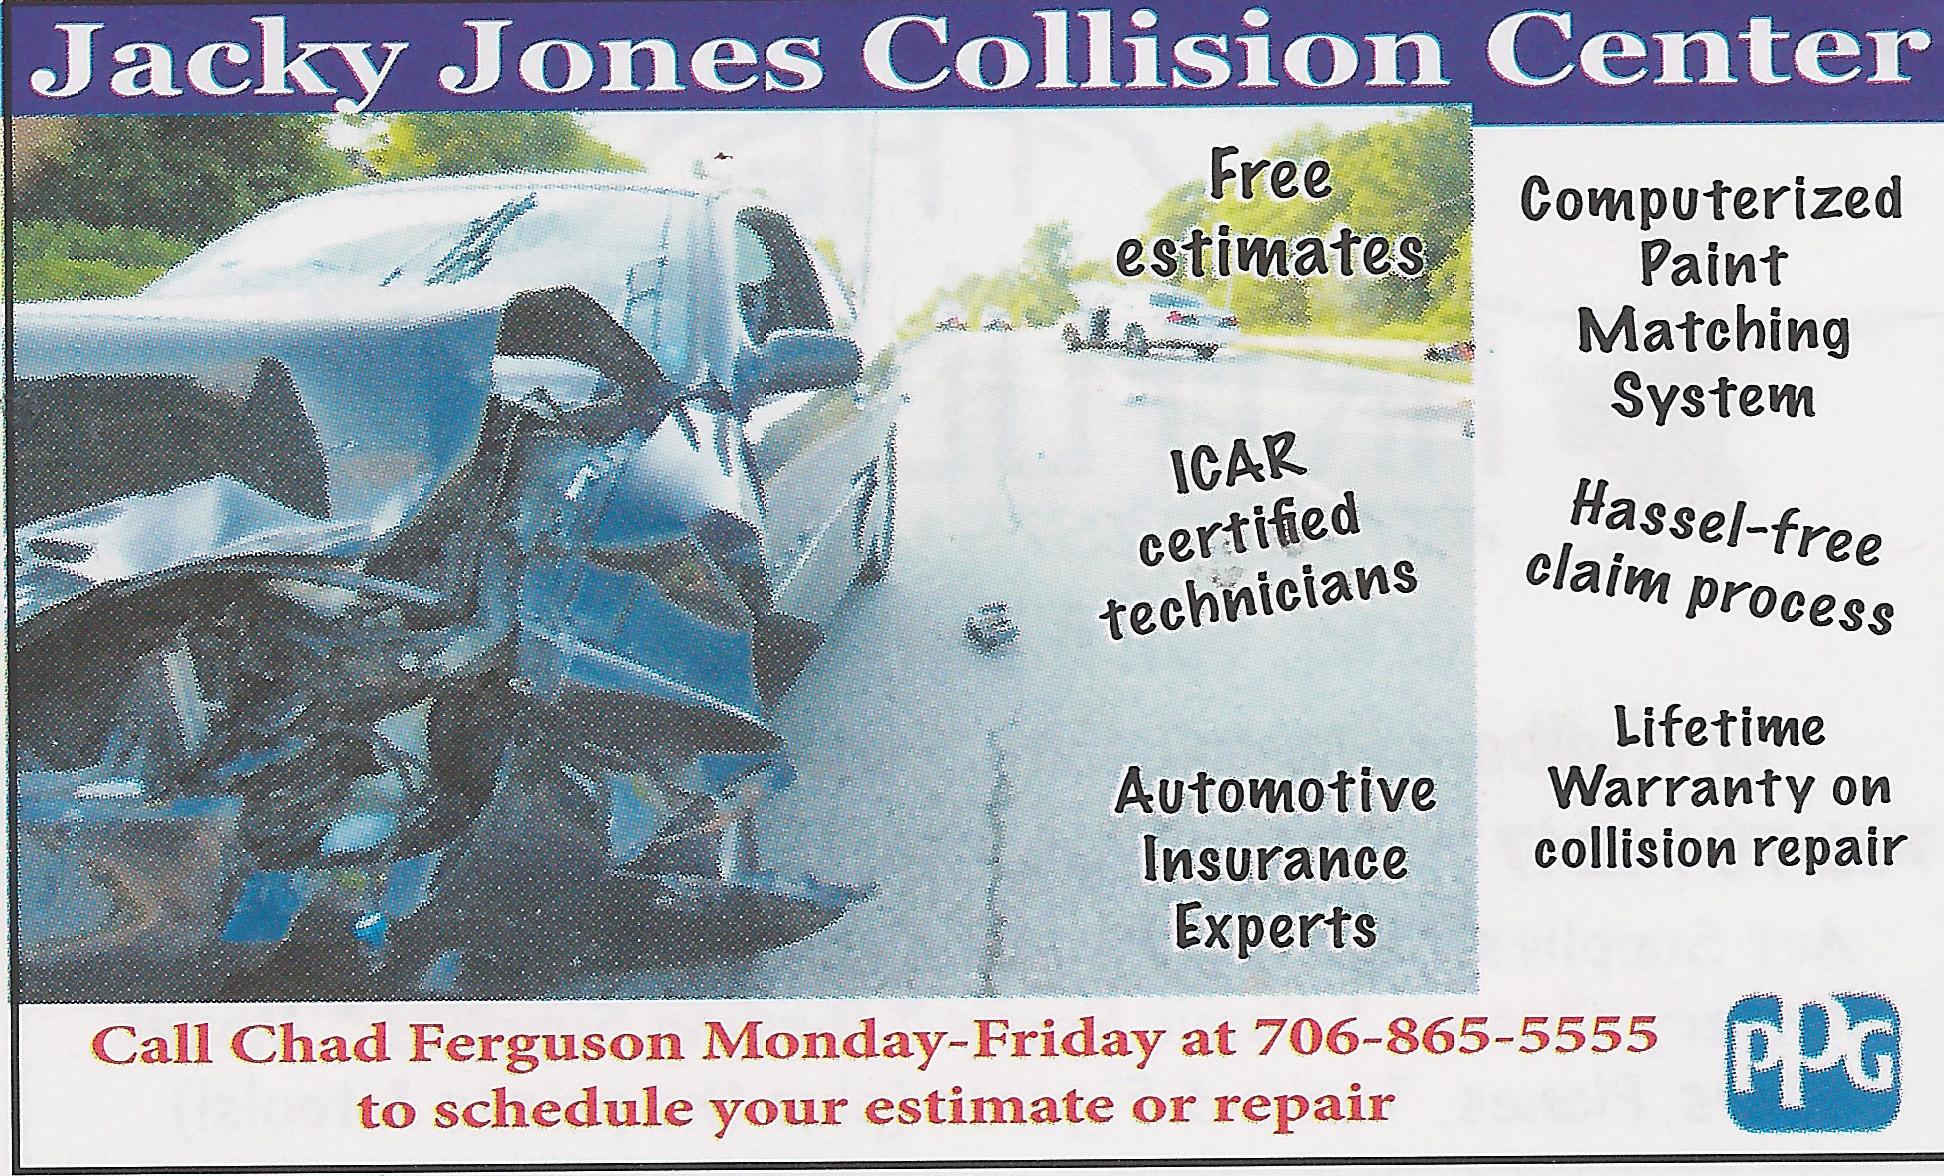 Jacky Jones Collision Center White County